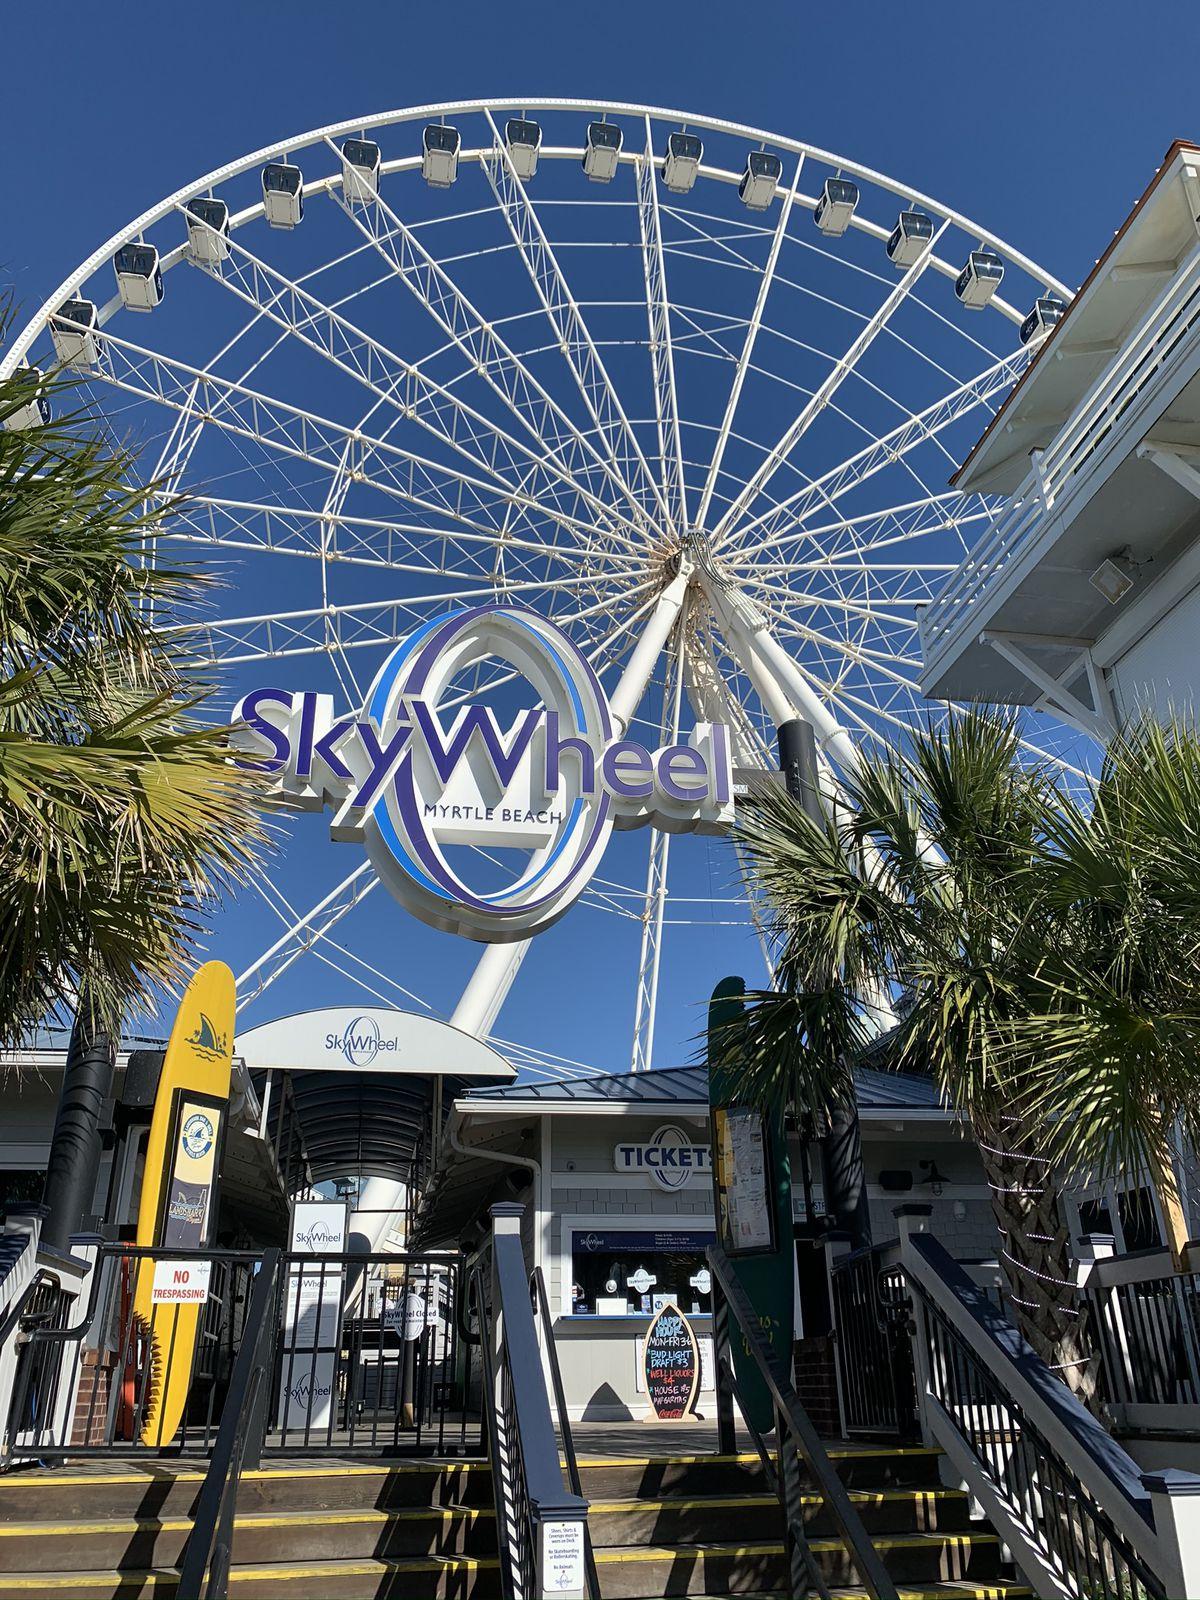 Myrtle Beach SkyWheel Closed For Winter Maintenance